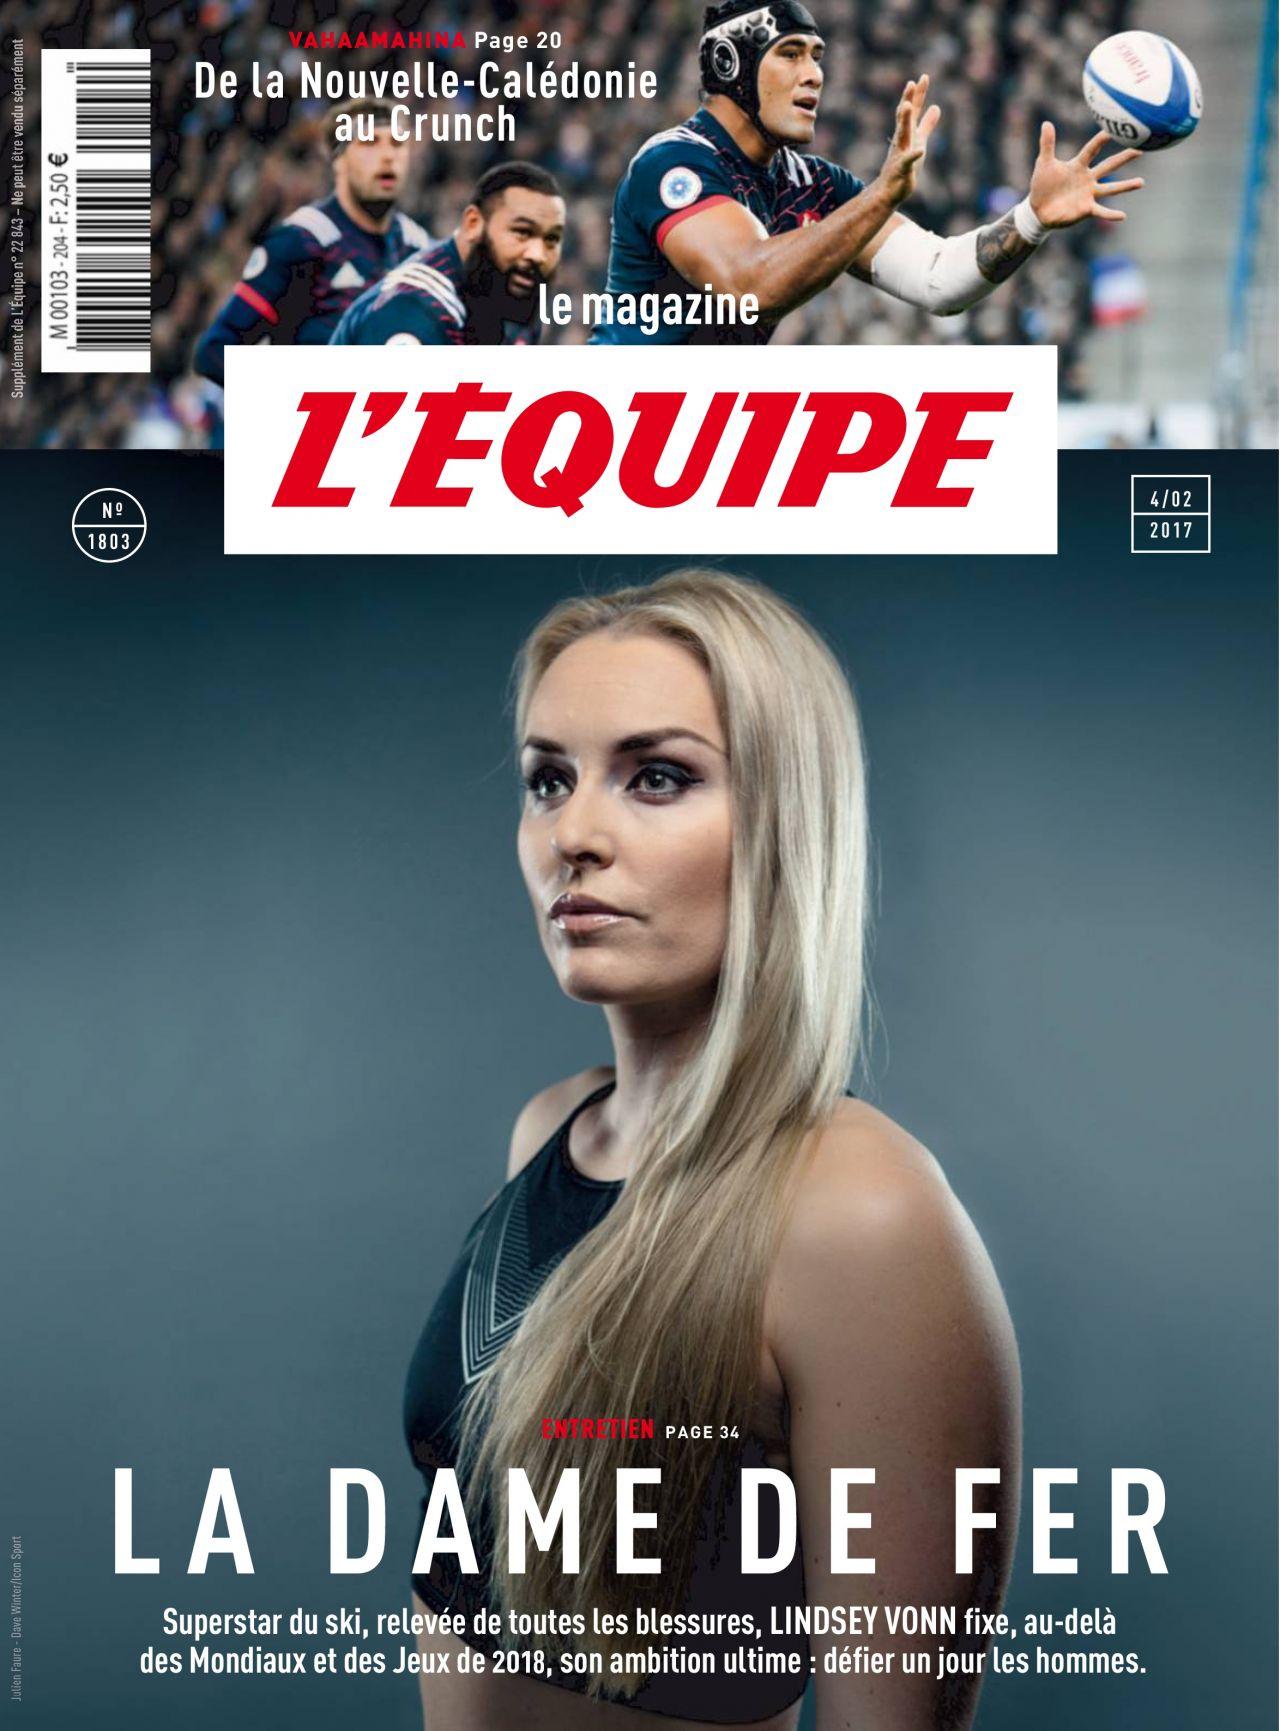 Lindsey Vonn L Equipe Magazine February 2017 Issue